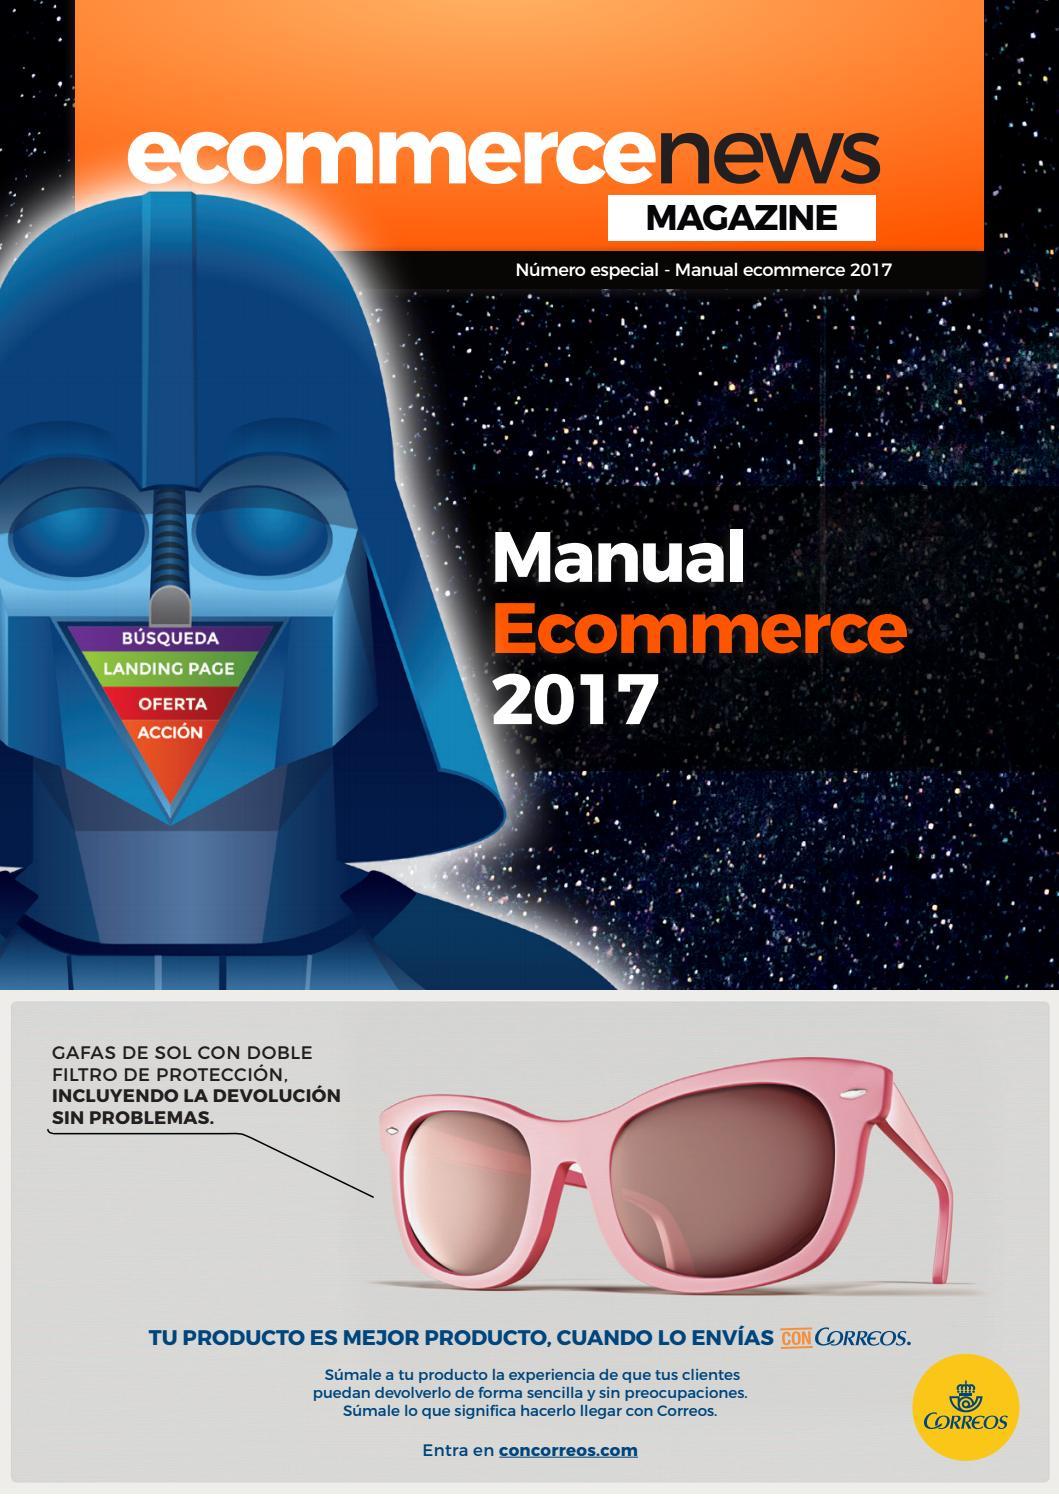 Manual Ecommerce 2017 by Ecommerce News - issuu 921f19a56c9